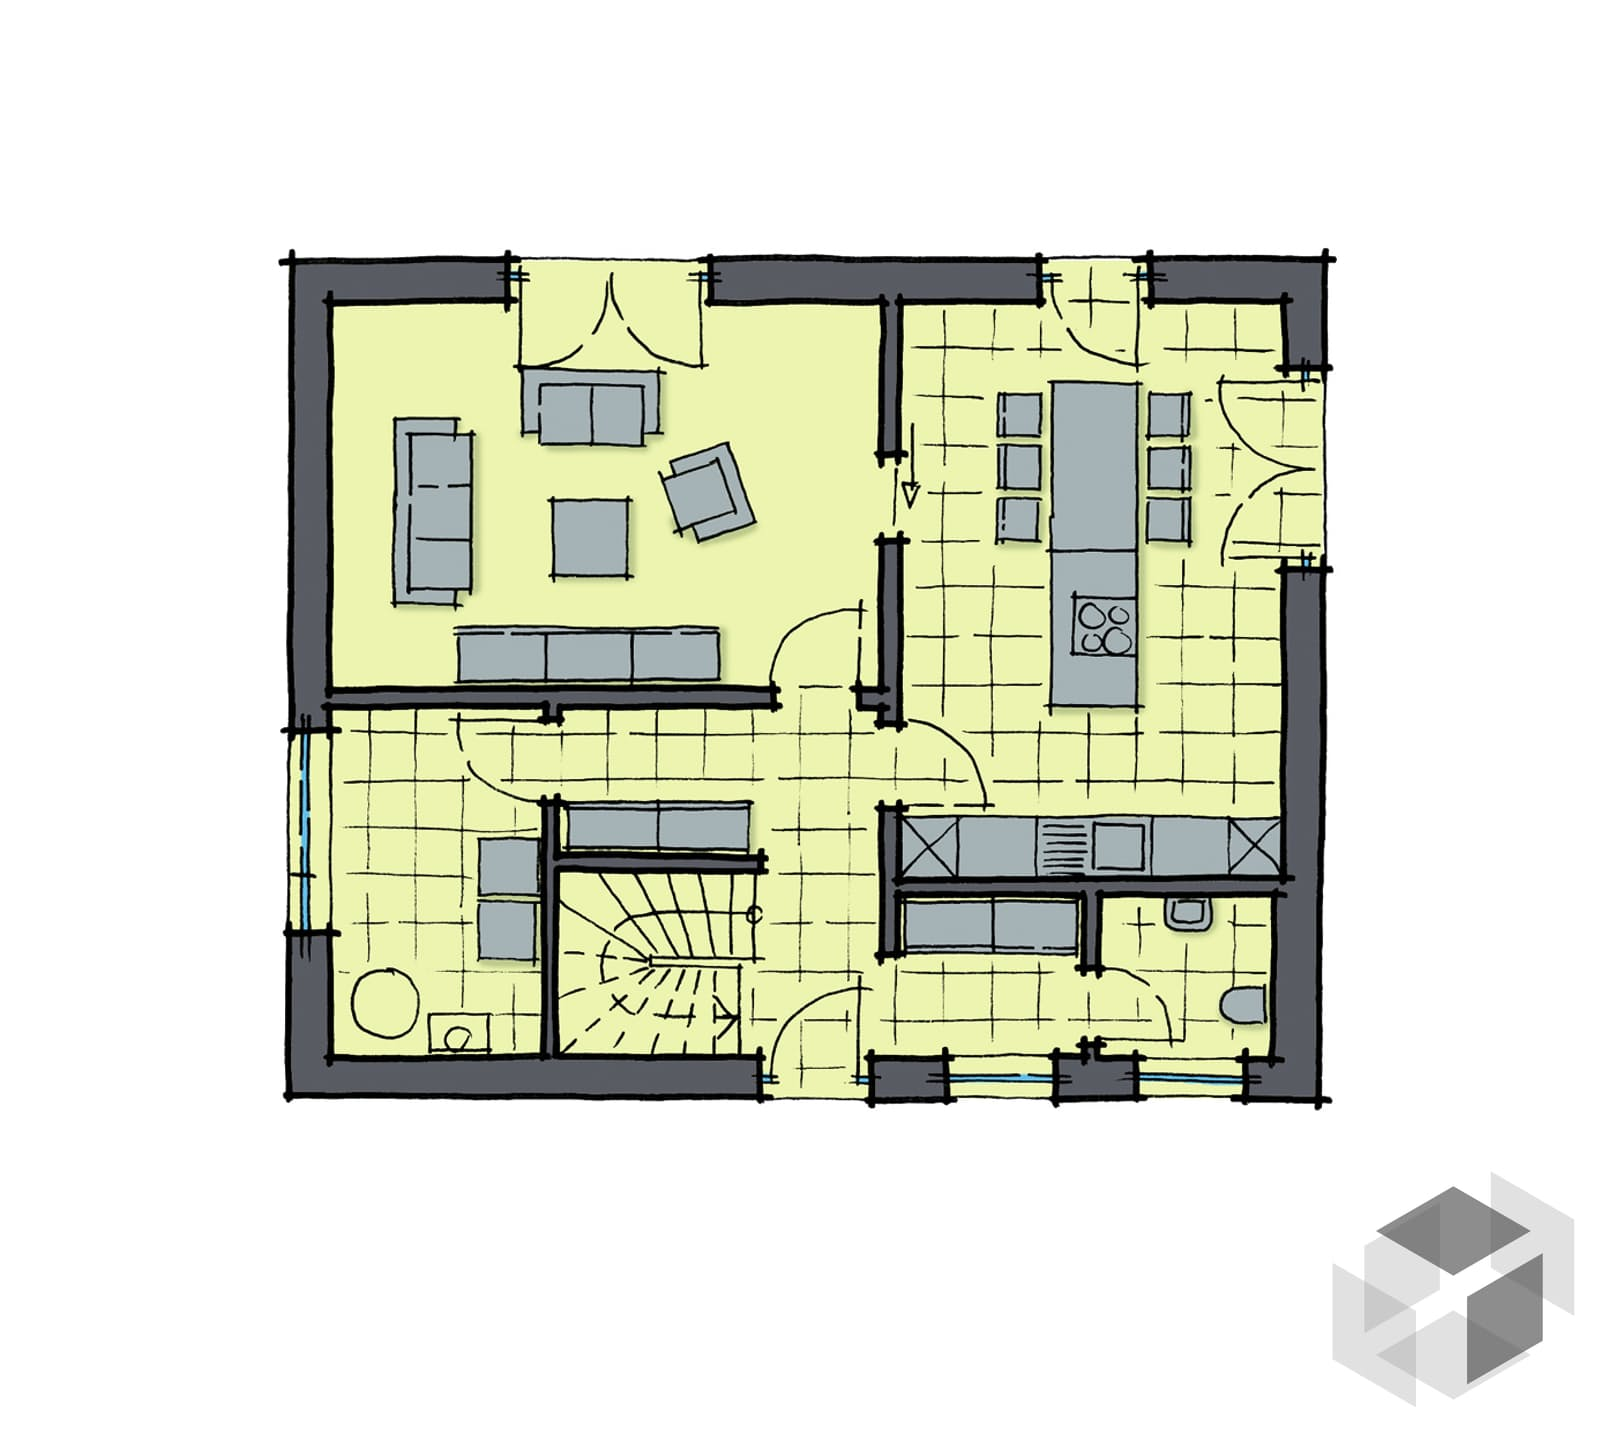 santa fe von gussek haus komplette daten bersicht. Black Bedroom Furniture Sets. Home Design Ideas